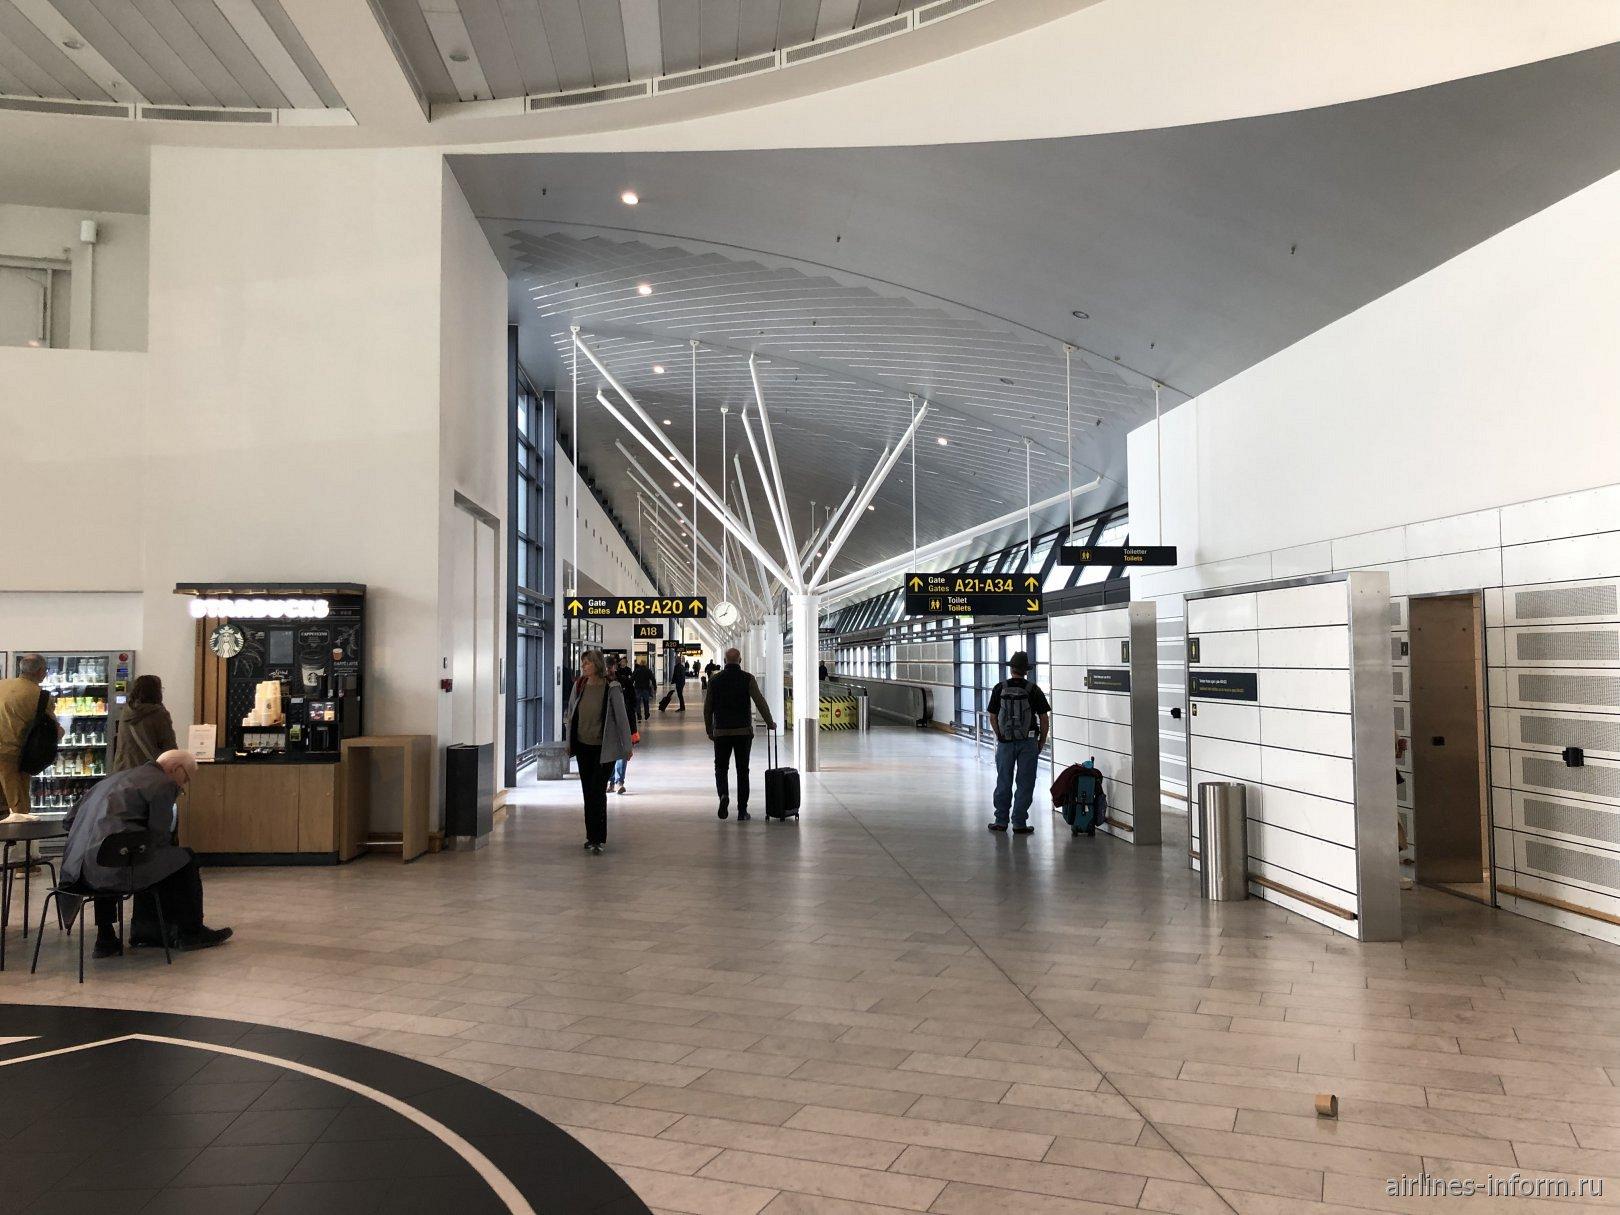 Галерея к гейтам в зоне F терминала 2 аэропорта Копенгаген Каструп